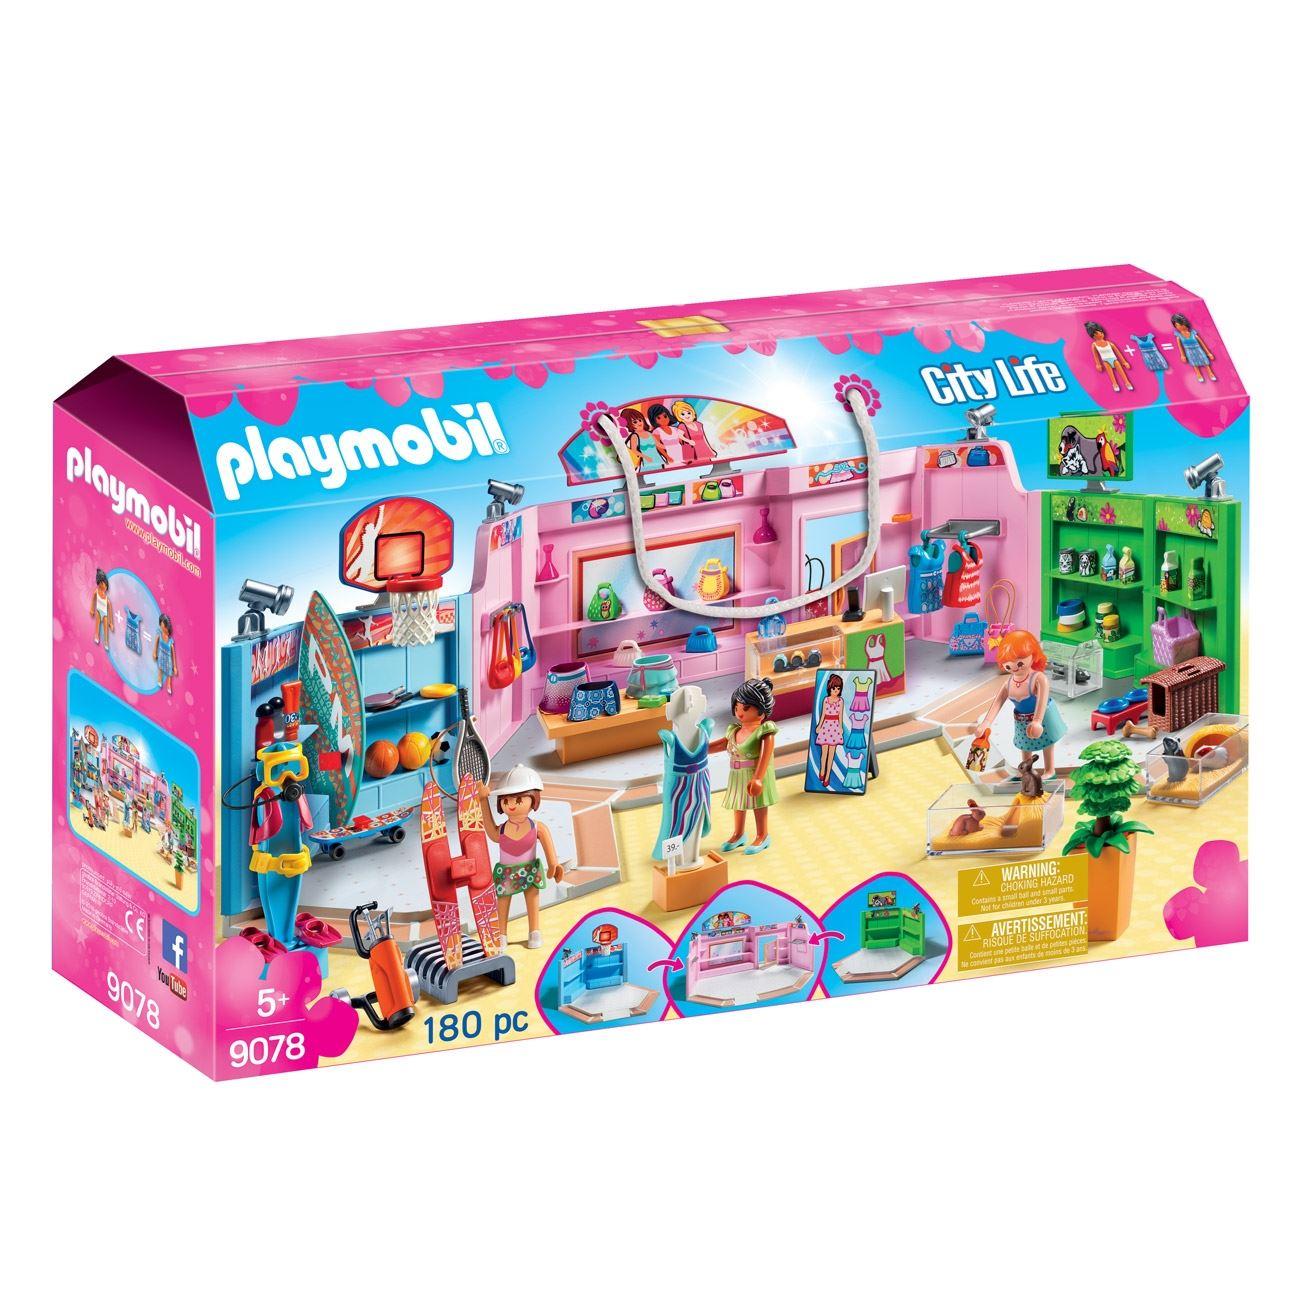 f95697fd90a2 PLM Εμπορικό Κέντρο   Playmobil Εμπορικό Κέντρο